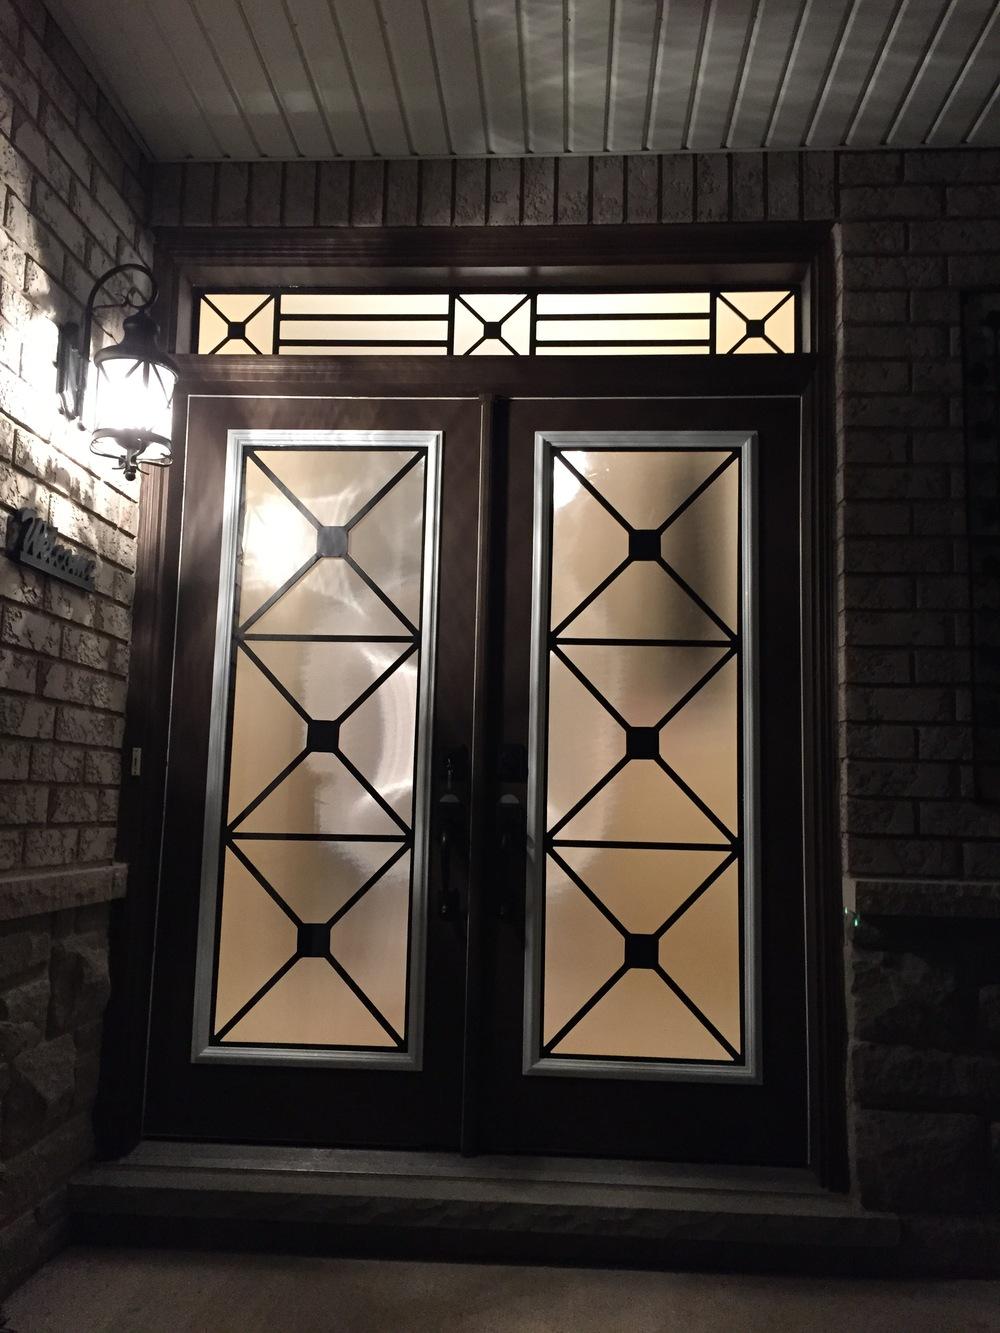 x-design-wrought-iron-glass-door-insert-bradford-on